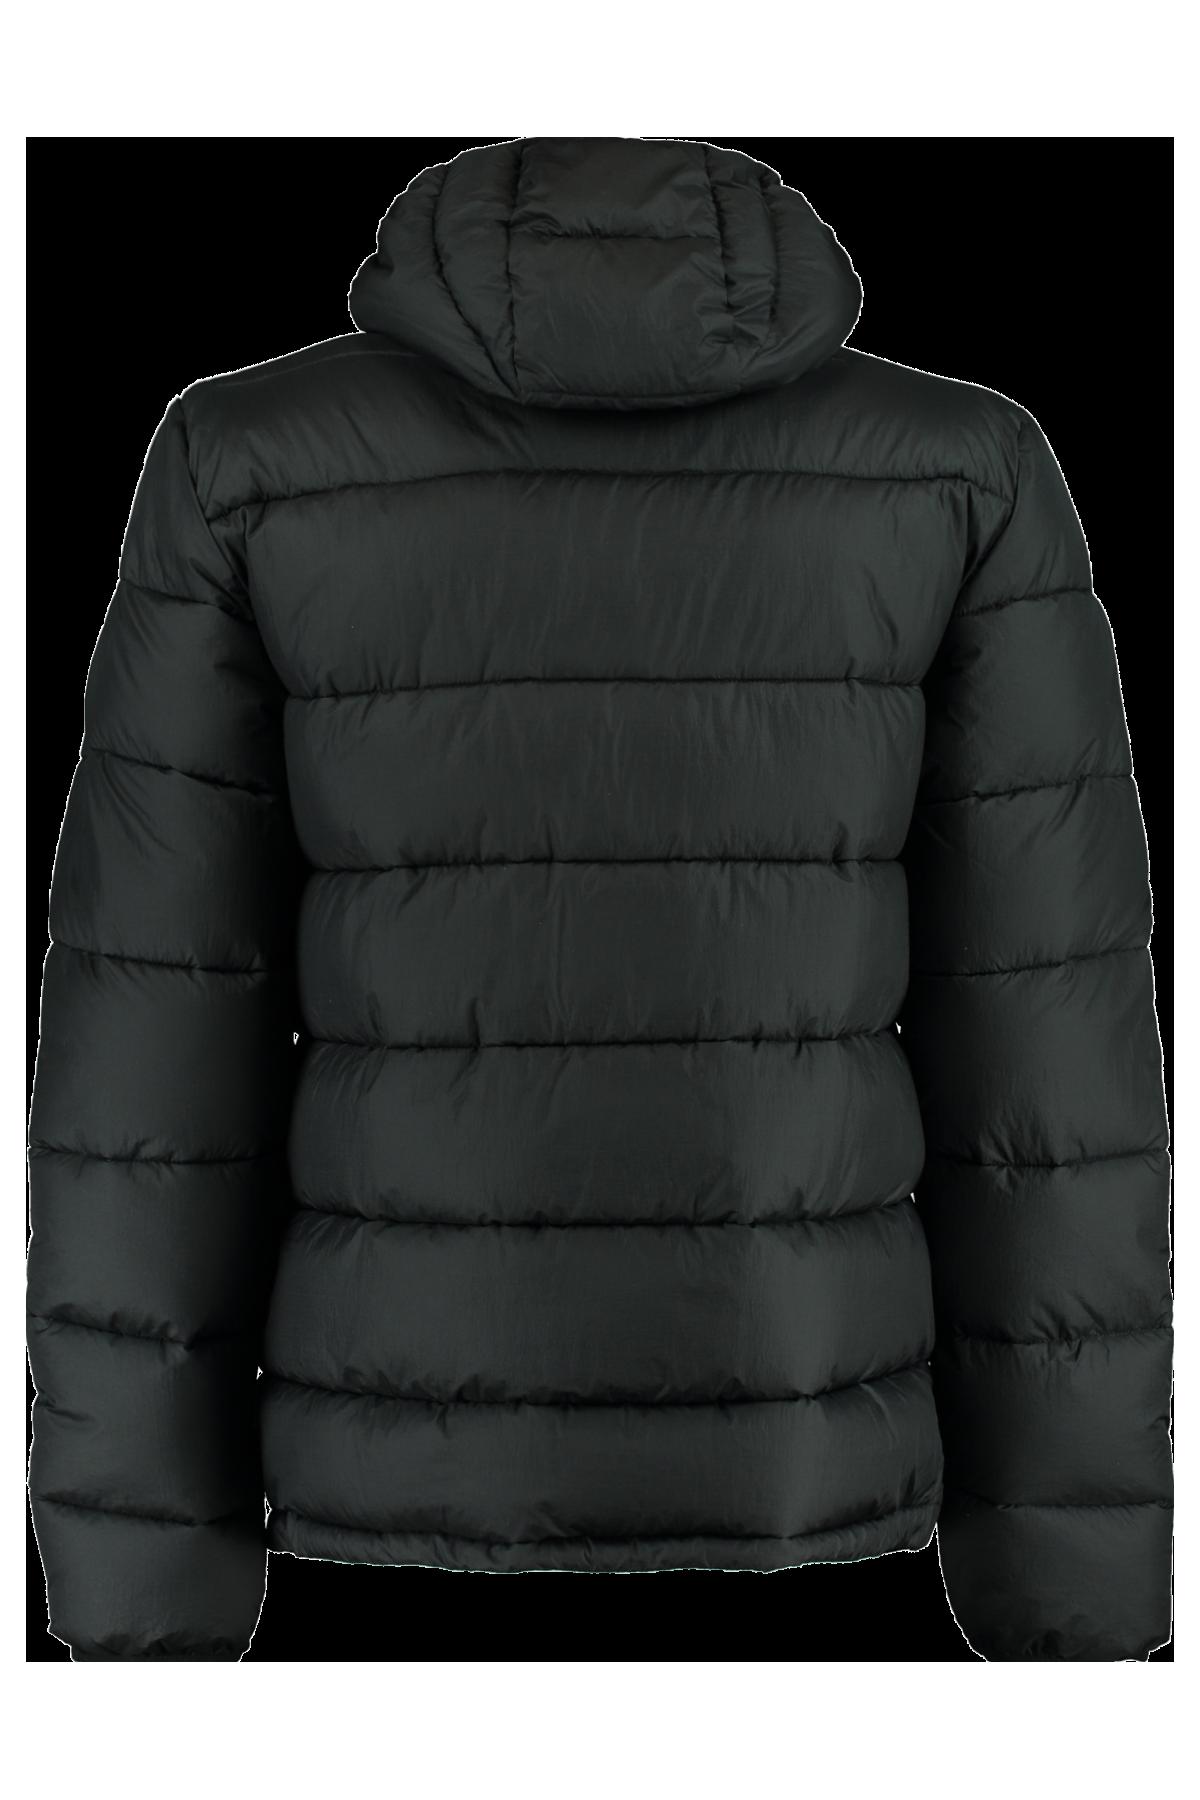 Jacket Justin